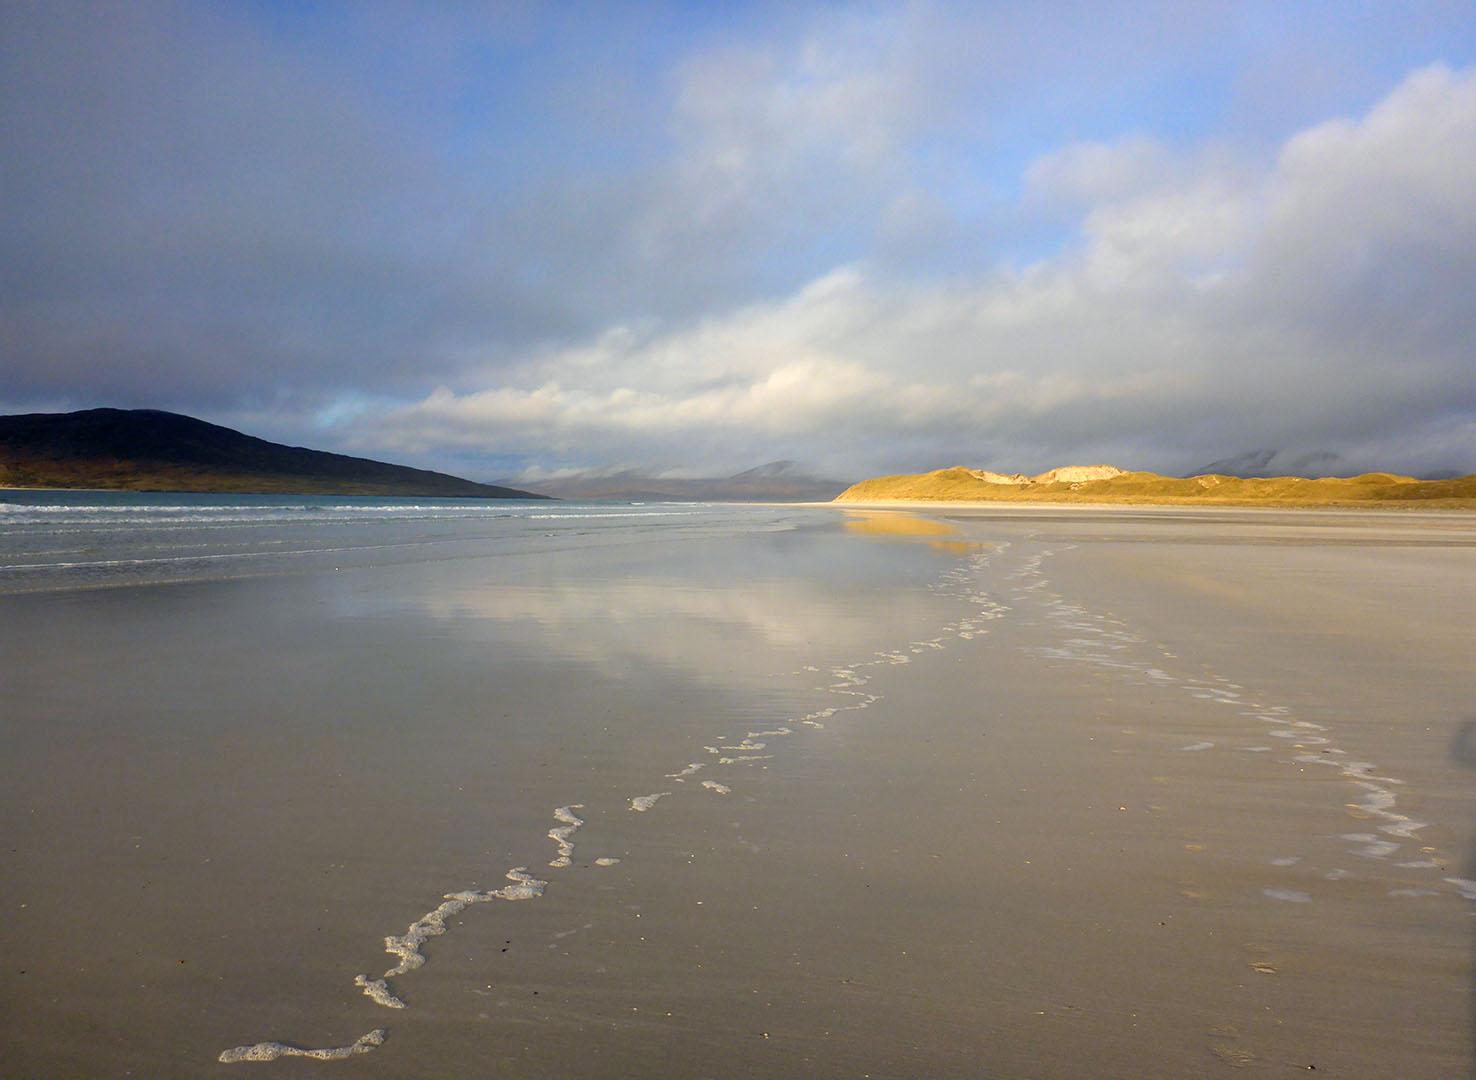 101 Island of Taransay & Luskentyre dunes